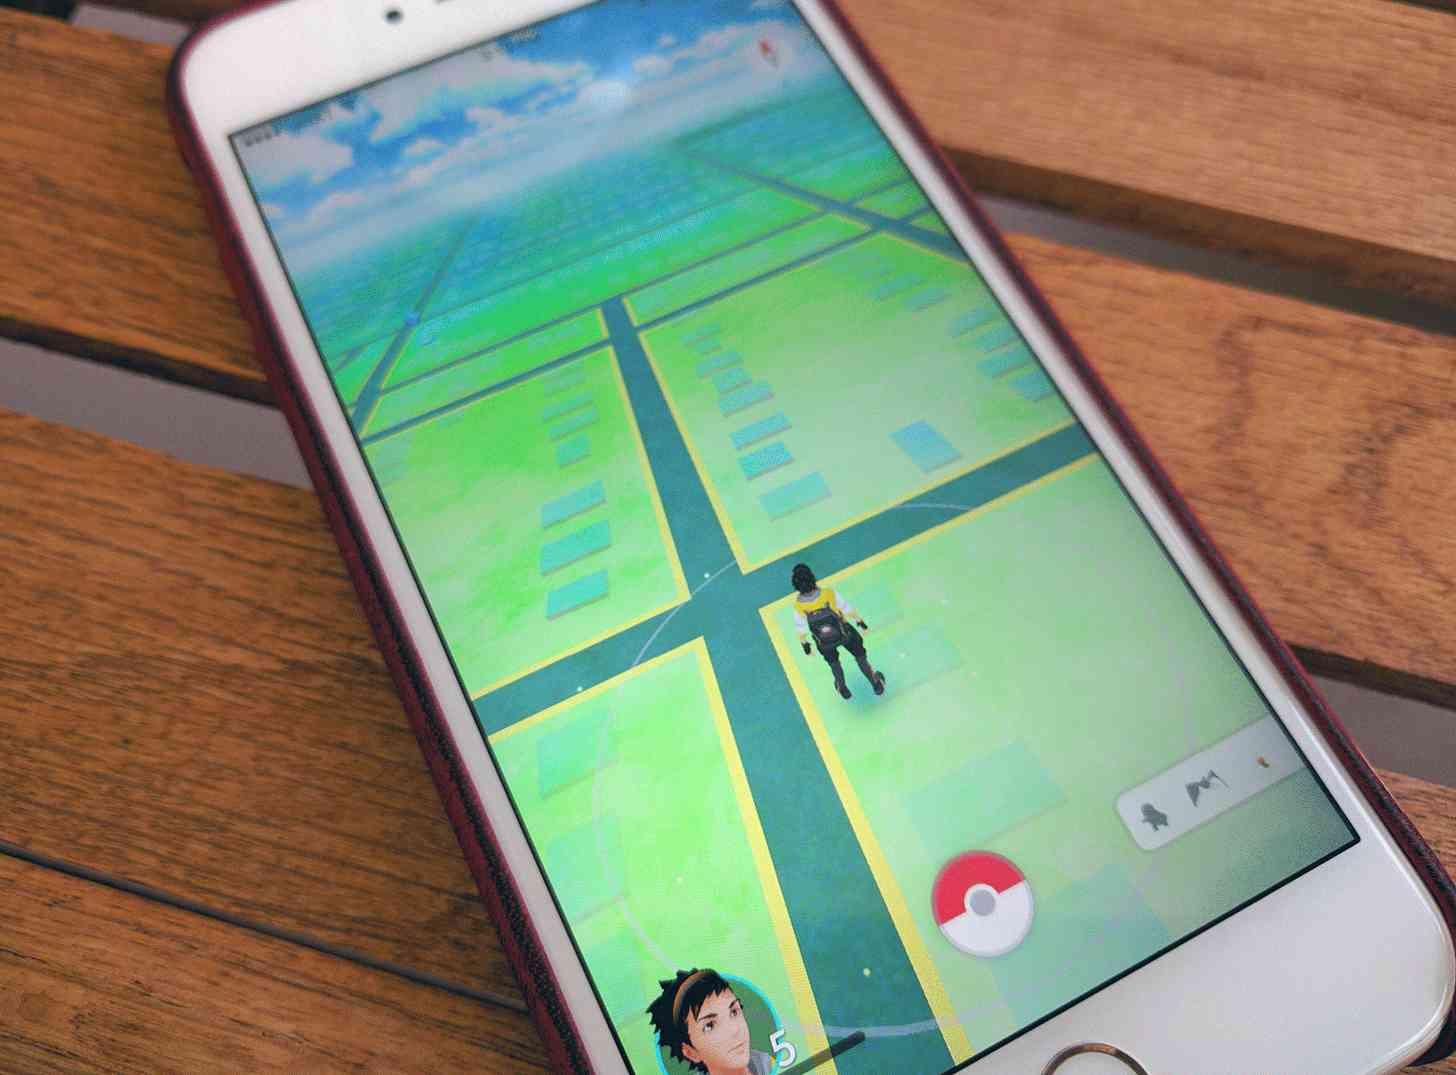 Pokémon Go iPhone app